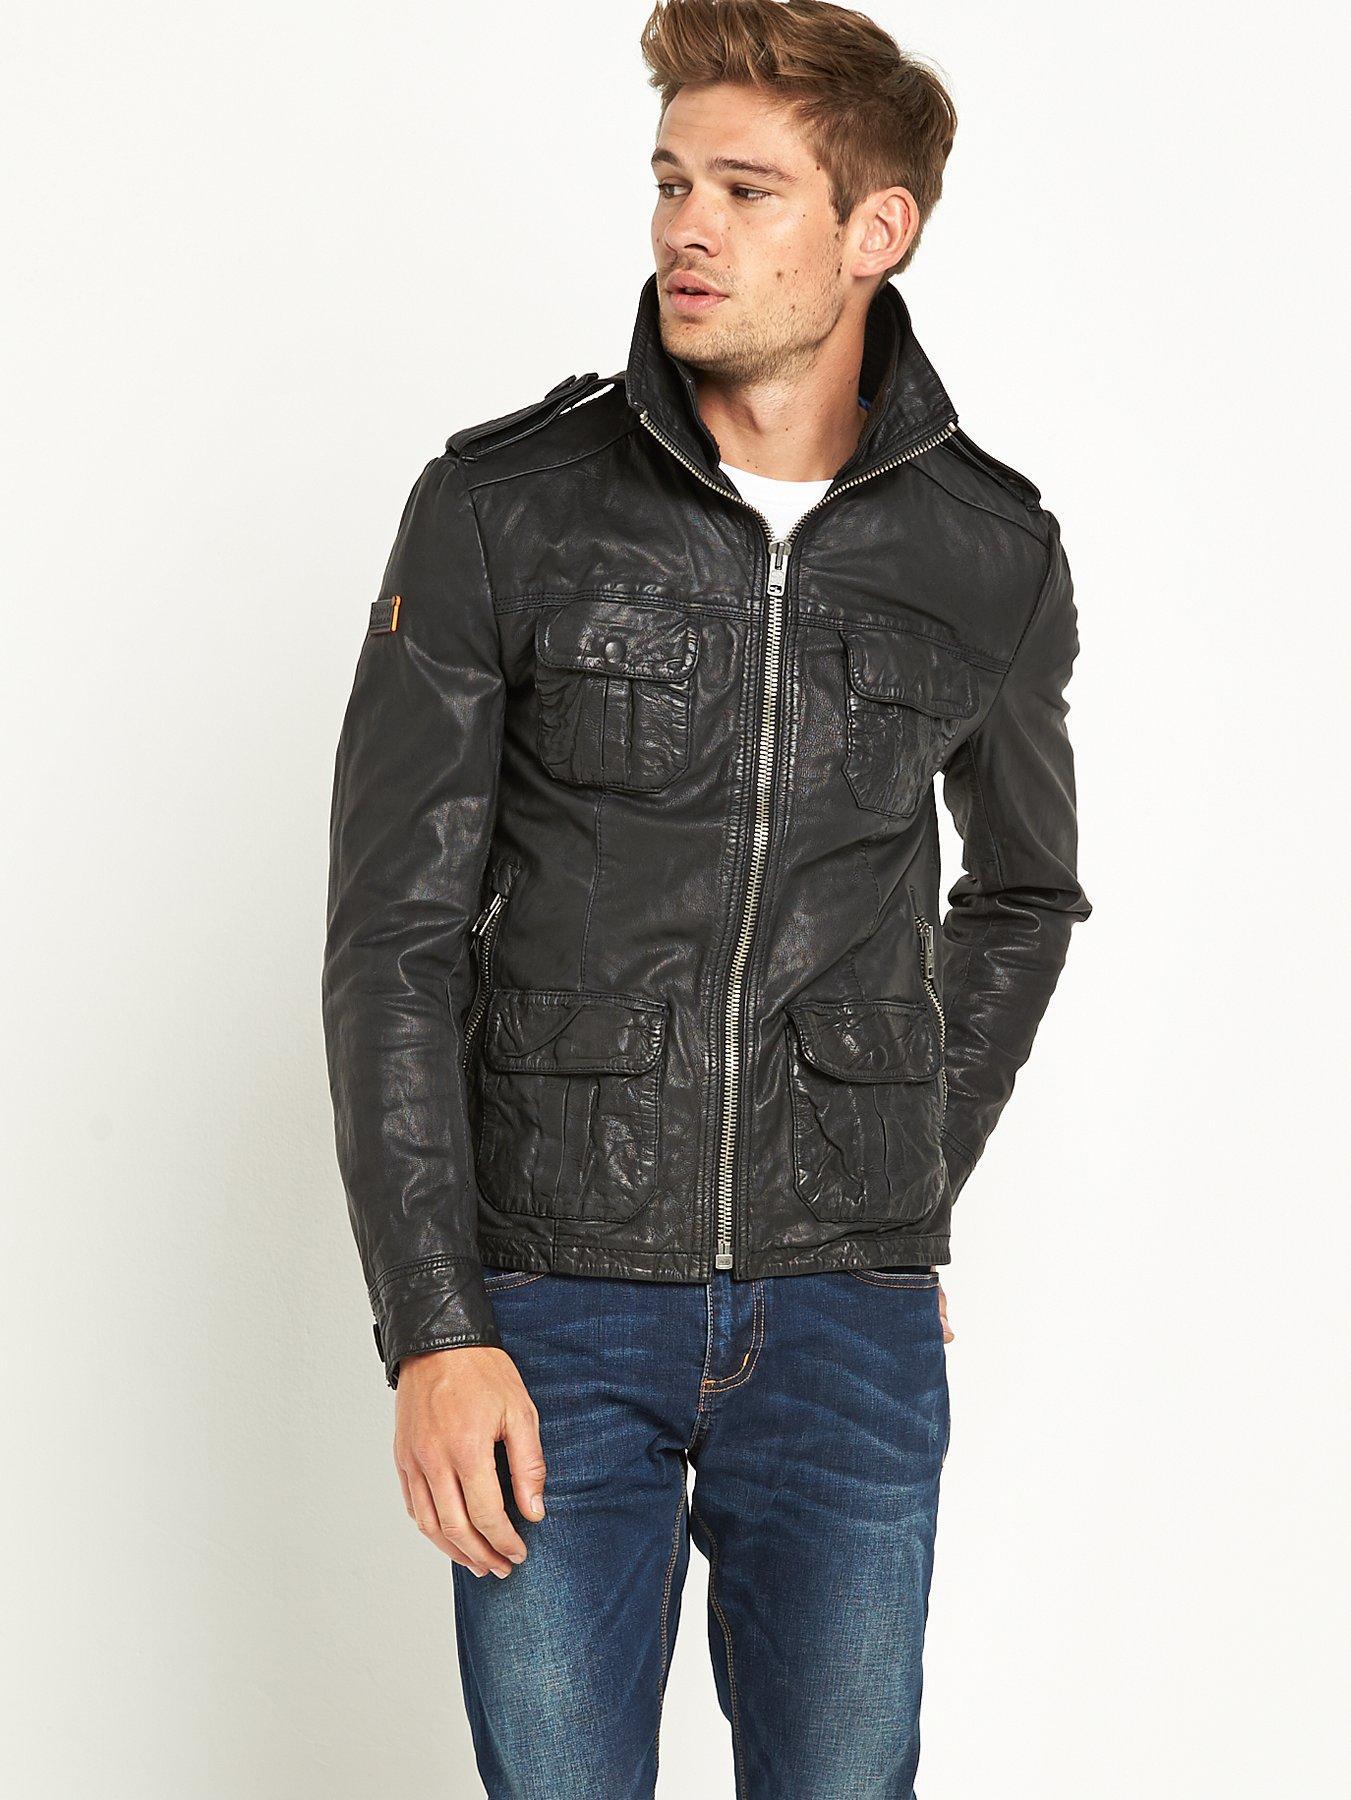 Leather jacket superdry - Superdry Brad Leather Jacket Superdry Brad Leather Jacket